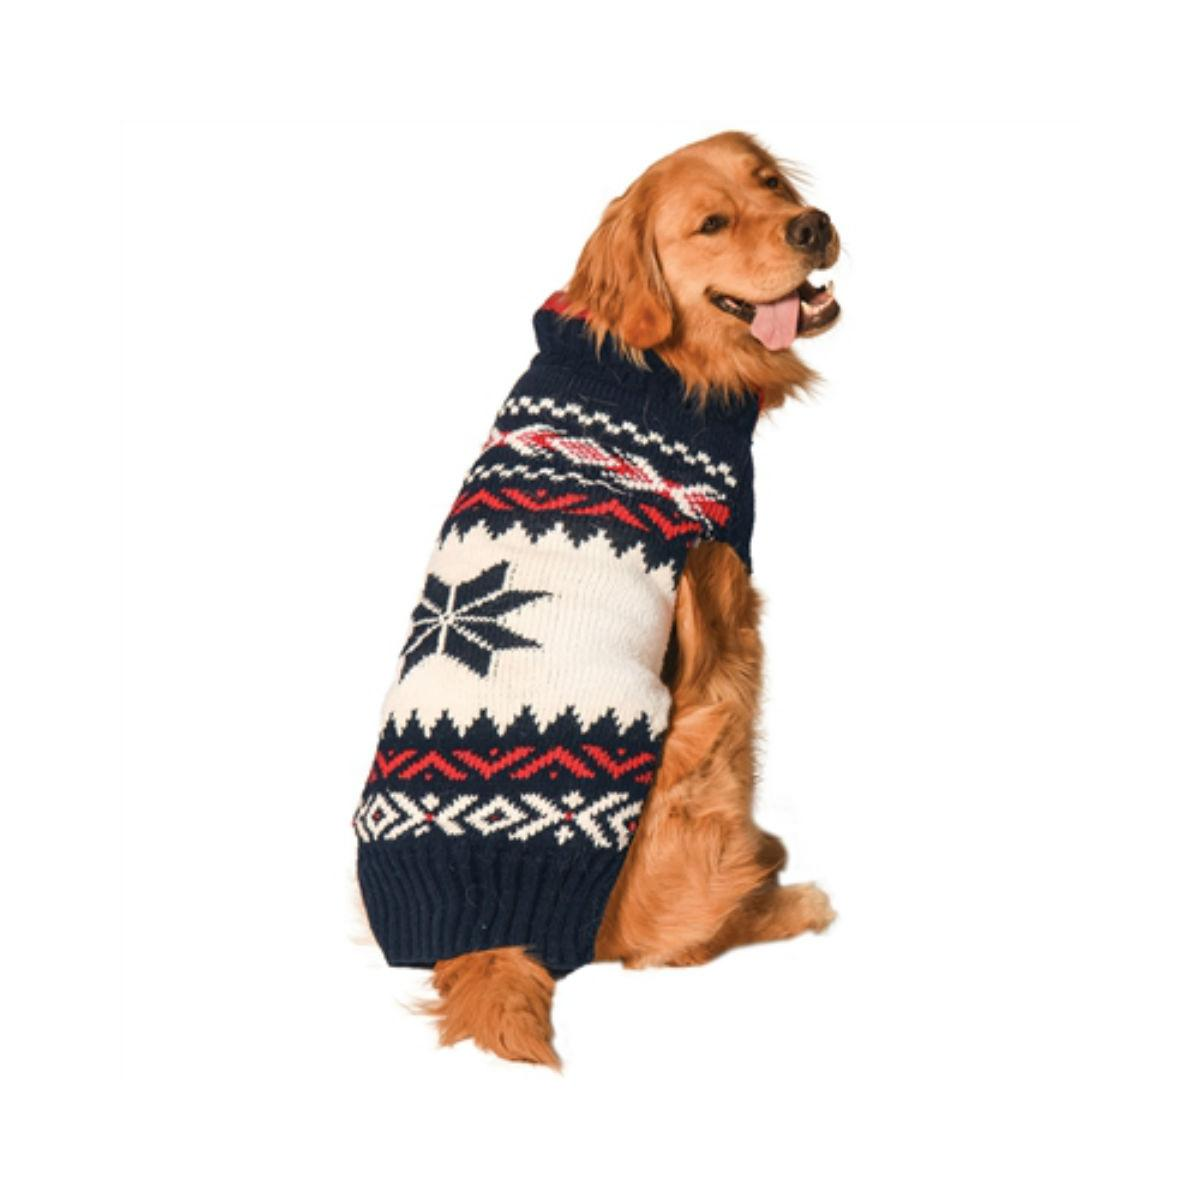 Handmade Vail Wool Dog Sweater - Navy